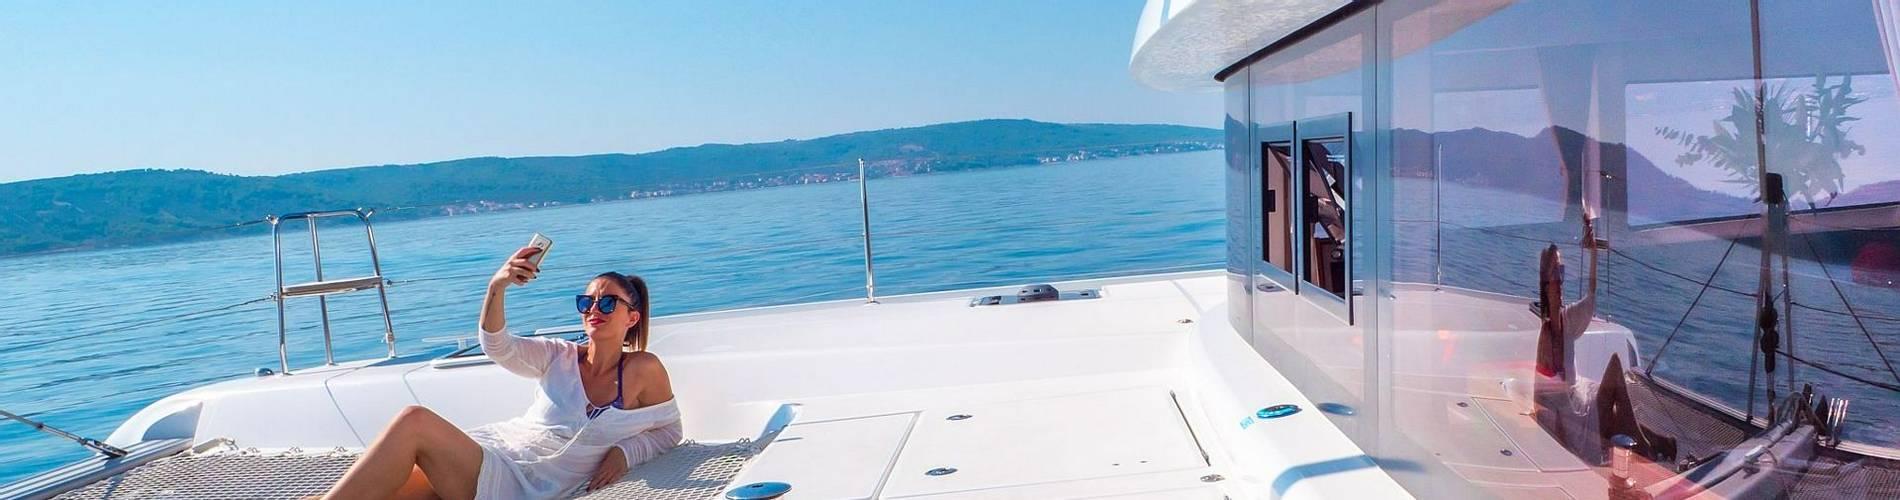 catamaran cruise 7.jpg